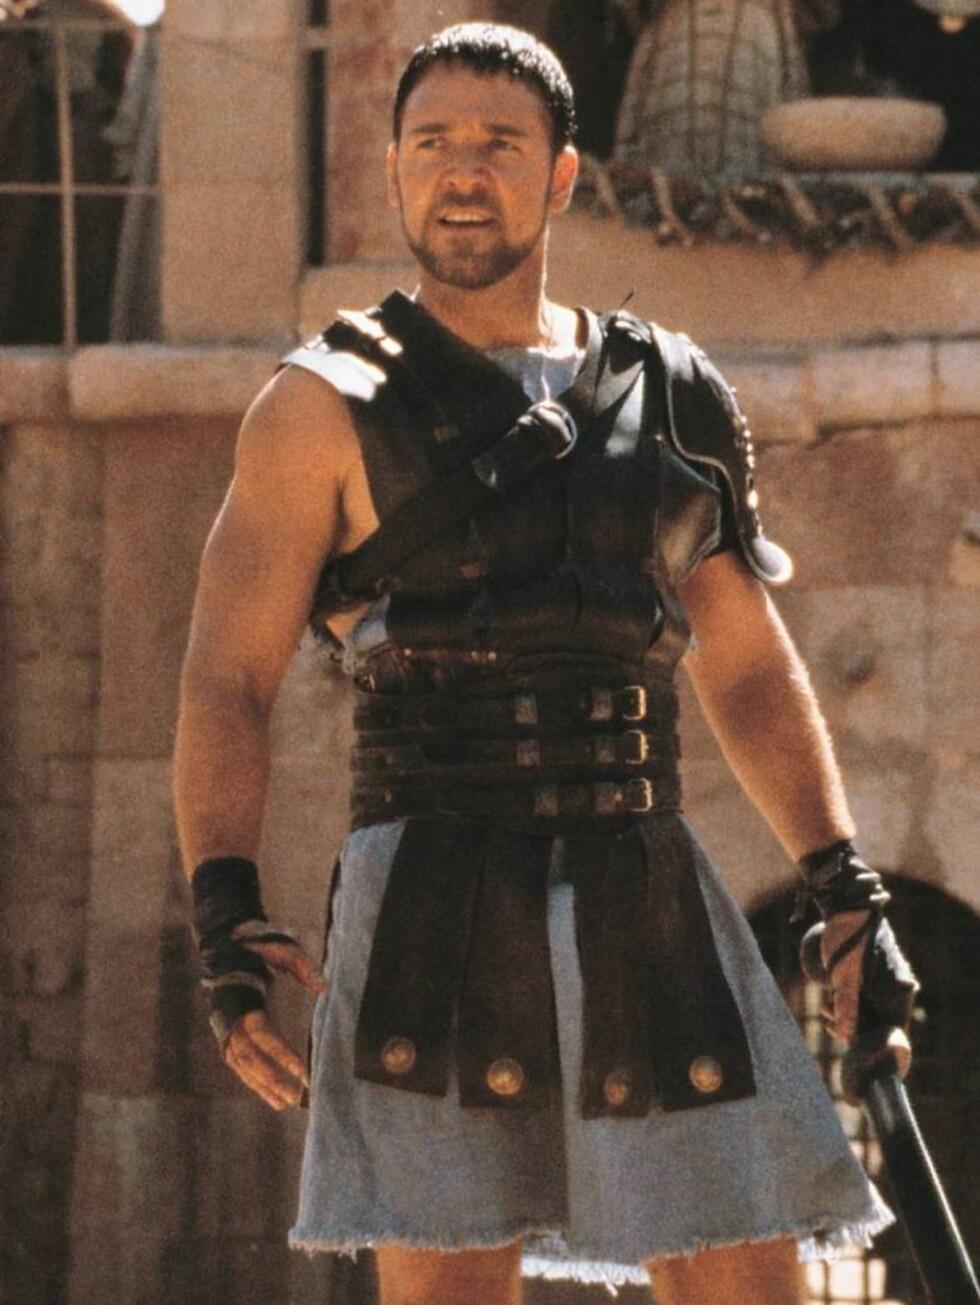 TØFF PAPPA: Oscar-vinner Russell Crowe ble sexsymbol verden over etter rollen i Gladiator. Foto: FilmWeb